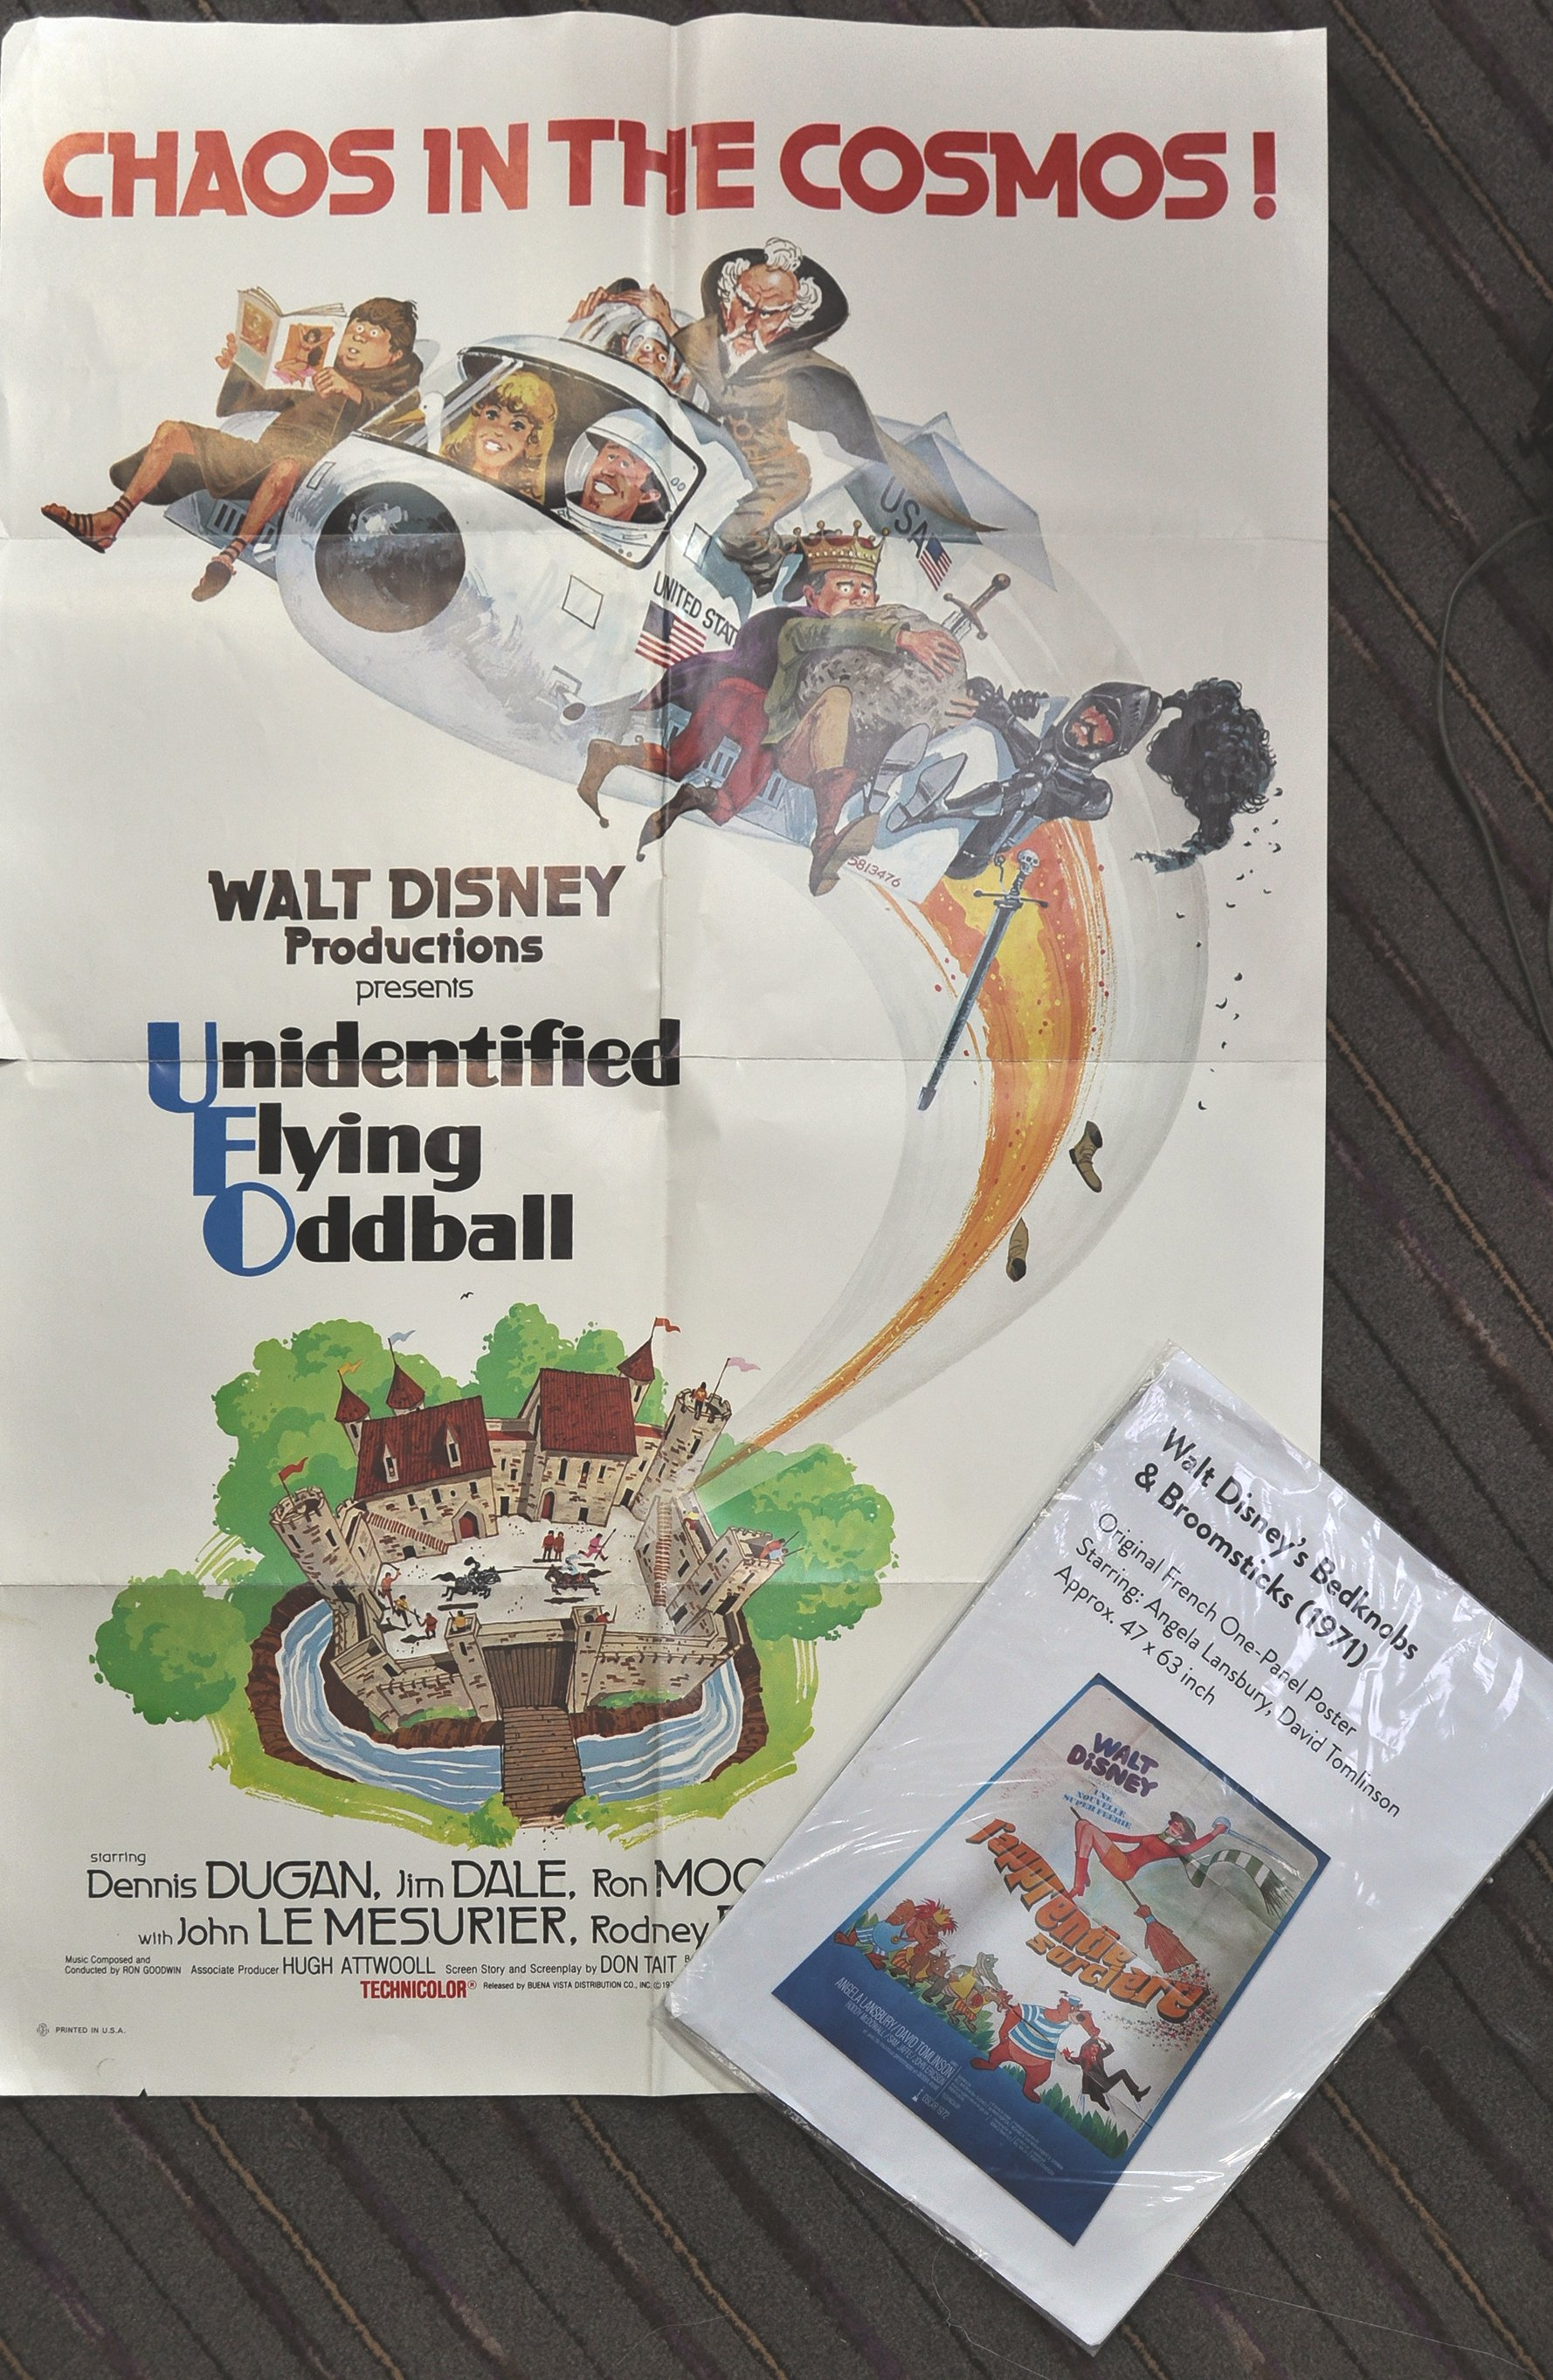 Lot 17 - TWO WALT DISNEY MOVIE CINEMA ADVERTISING FILM POSTERS